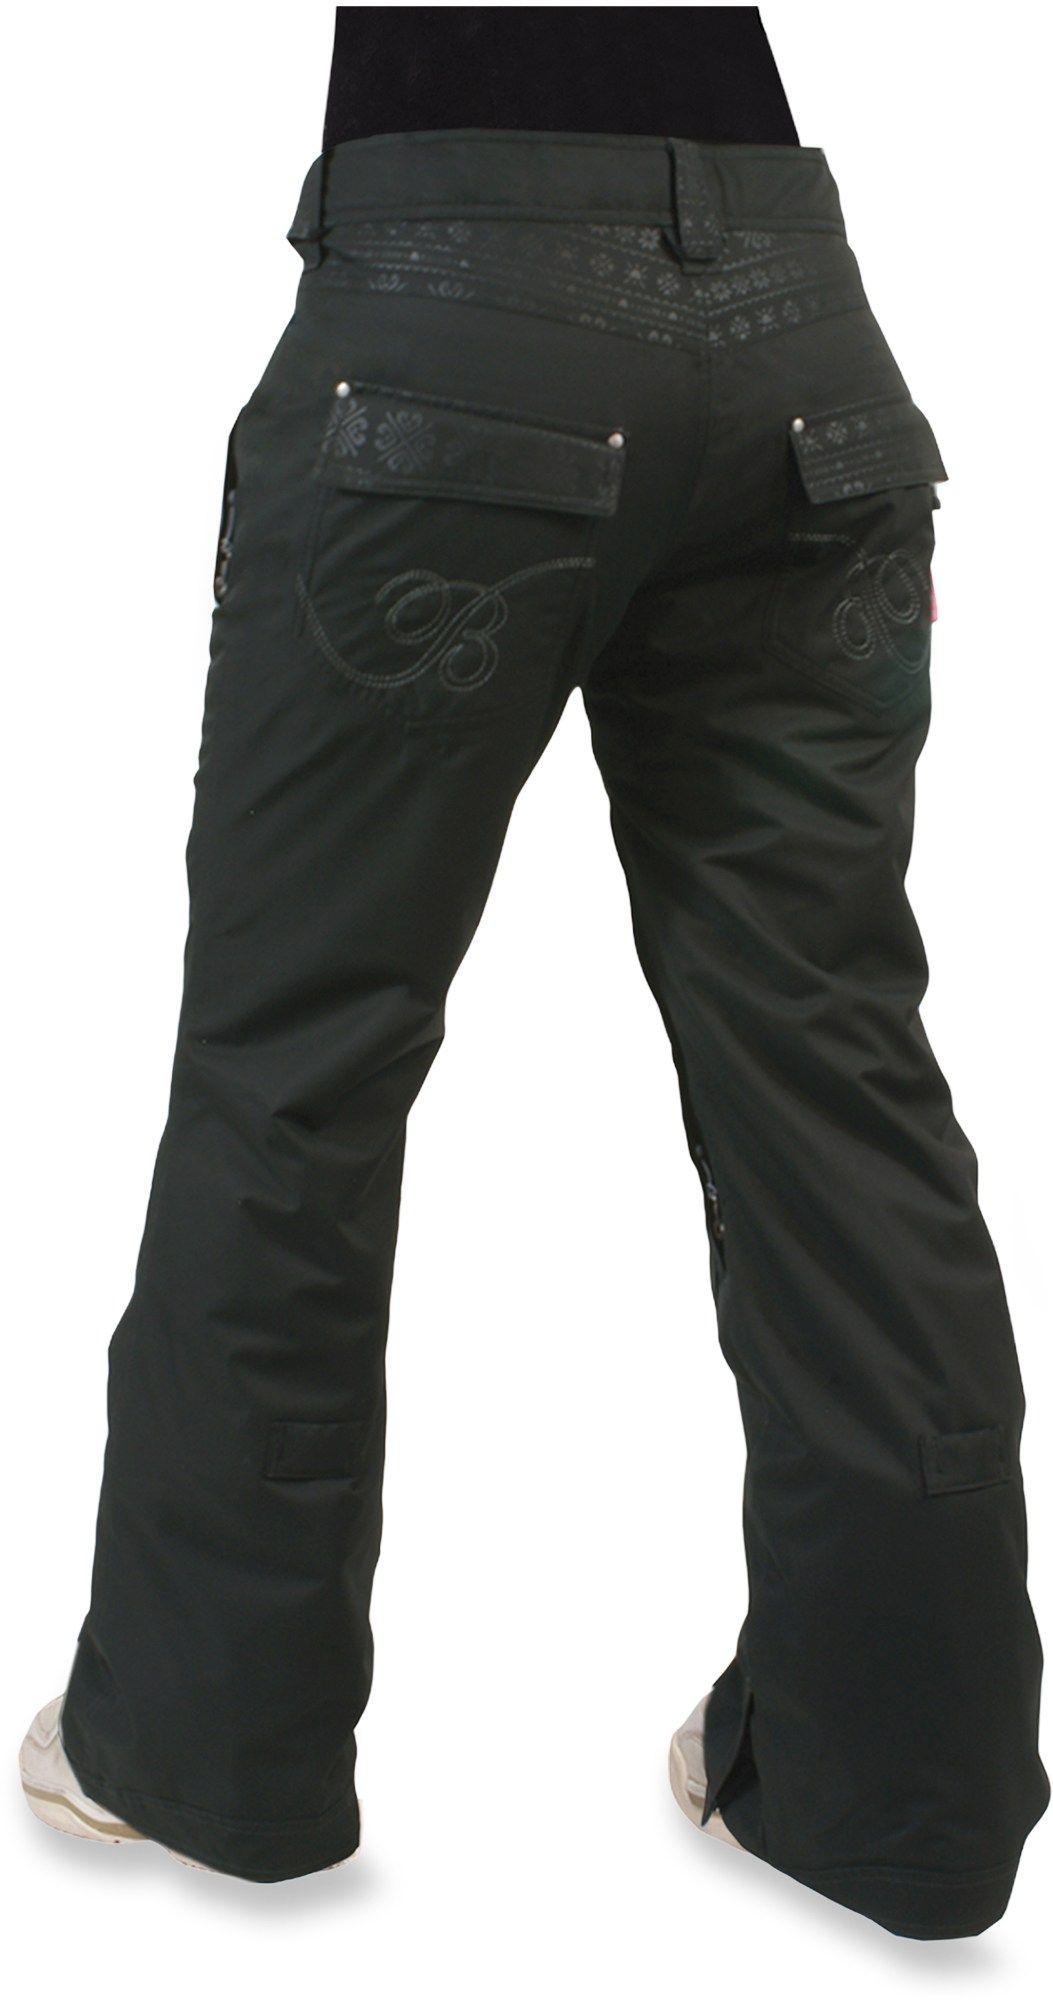 c2206b05320 Betty Rides All Mountain Rocker Insulated Pants - Women s - Free Shipping  at REI.com